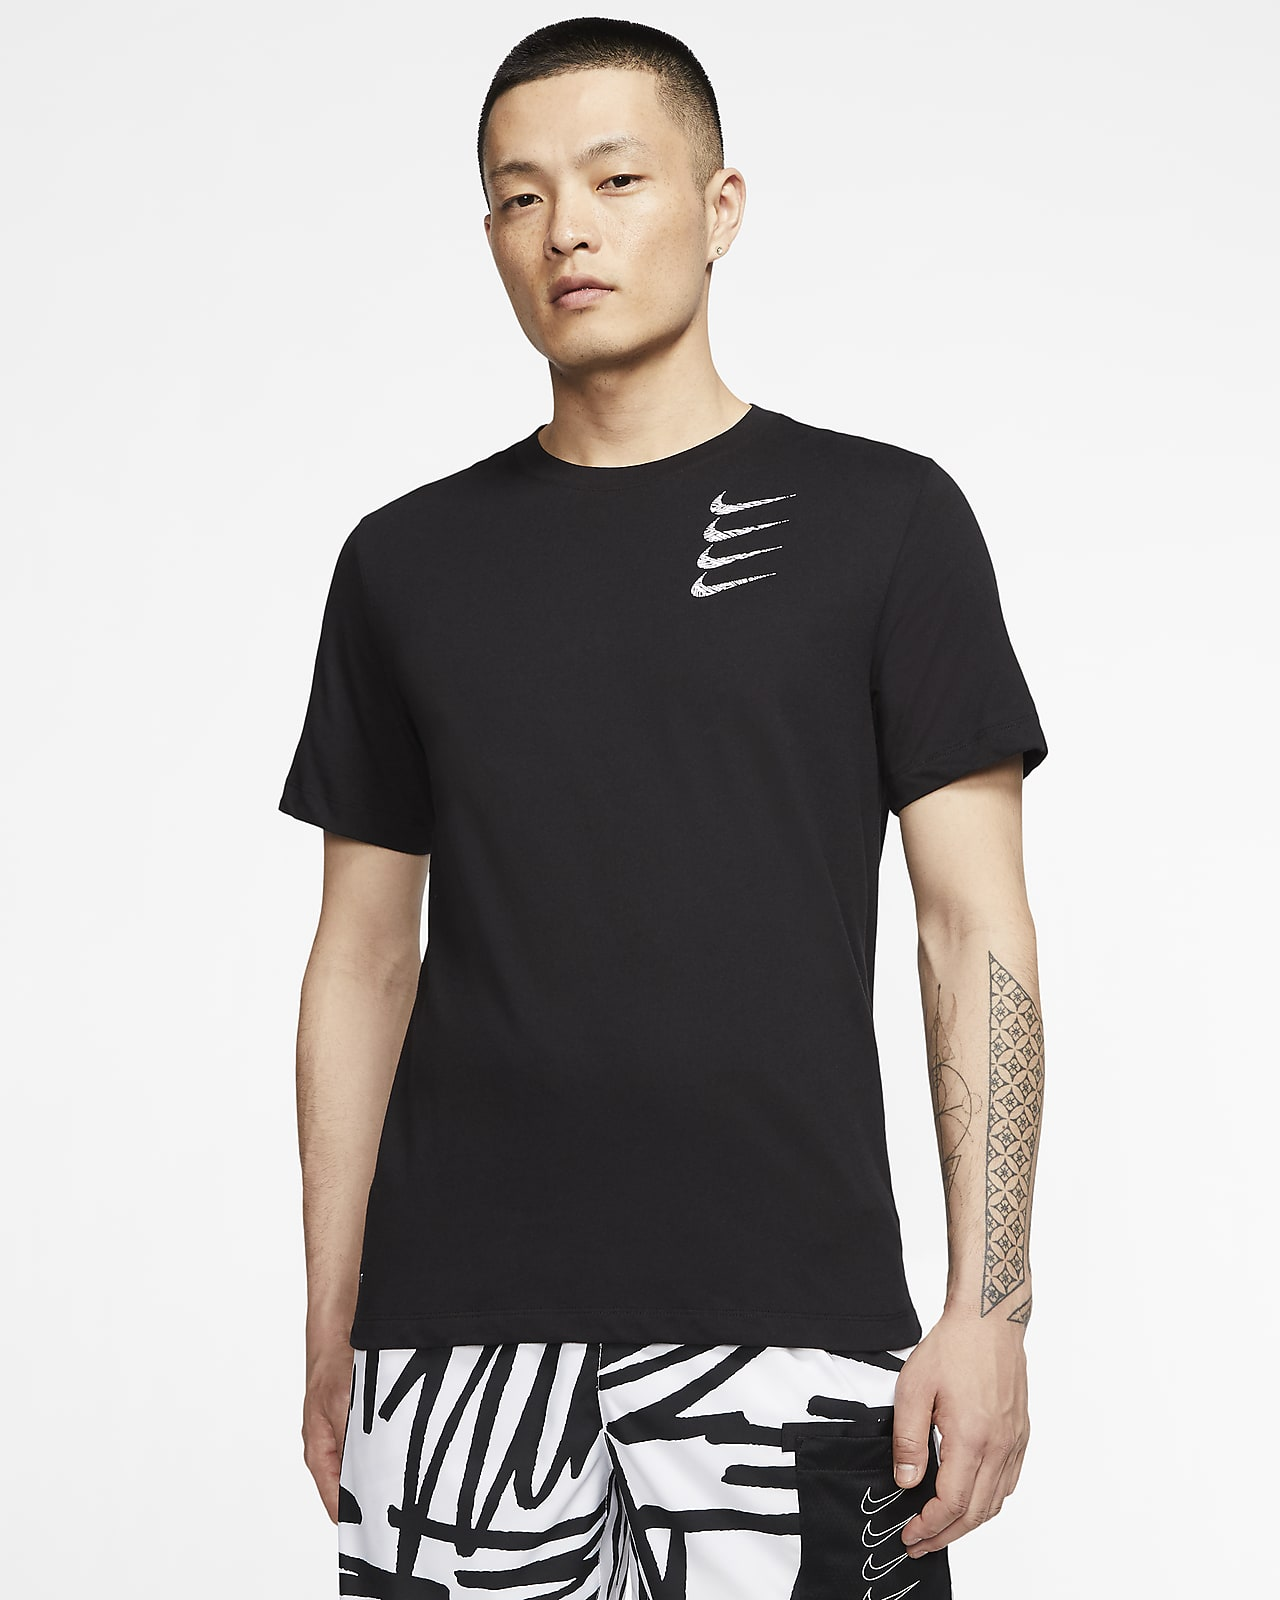 Nike Dri-FIT Men's Graphic Training T